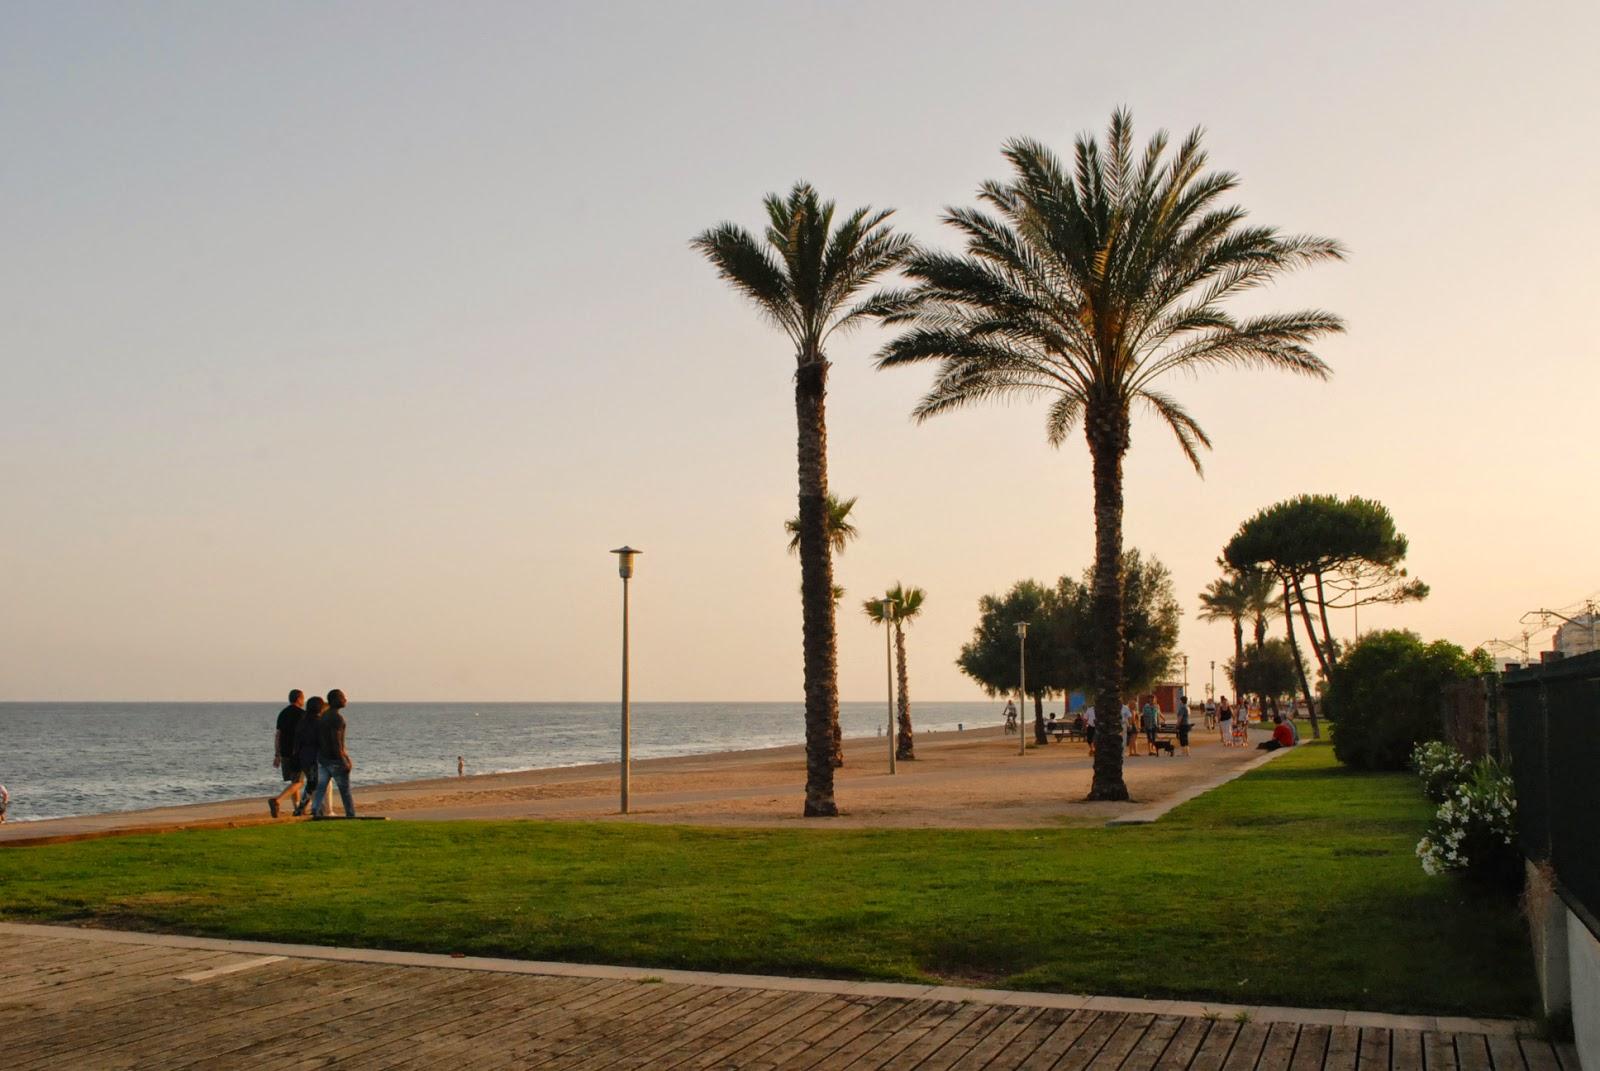 Пинеда де мар, Коста-дель-Маресме, Каталония, Испания/Pineda de Mar, Costa del Maresme, Catalonia, Spain.